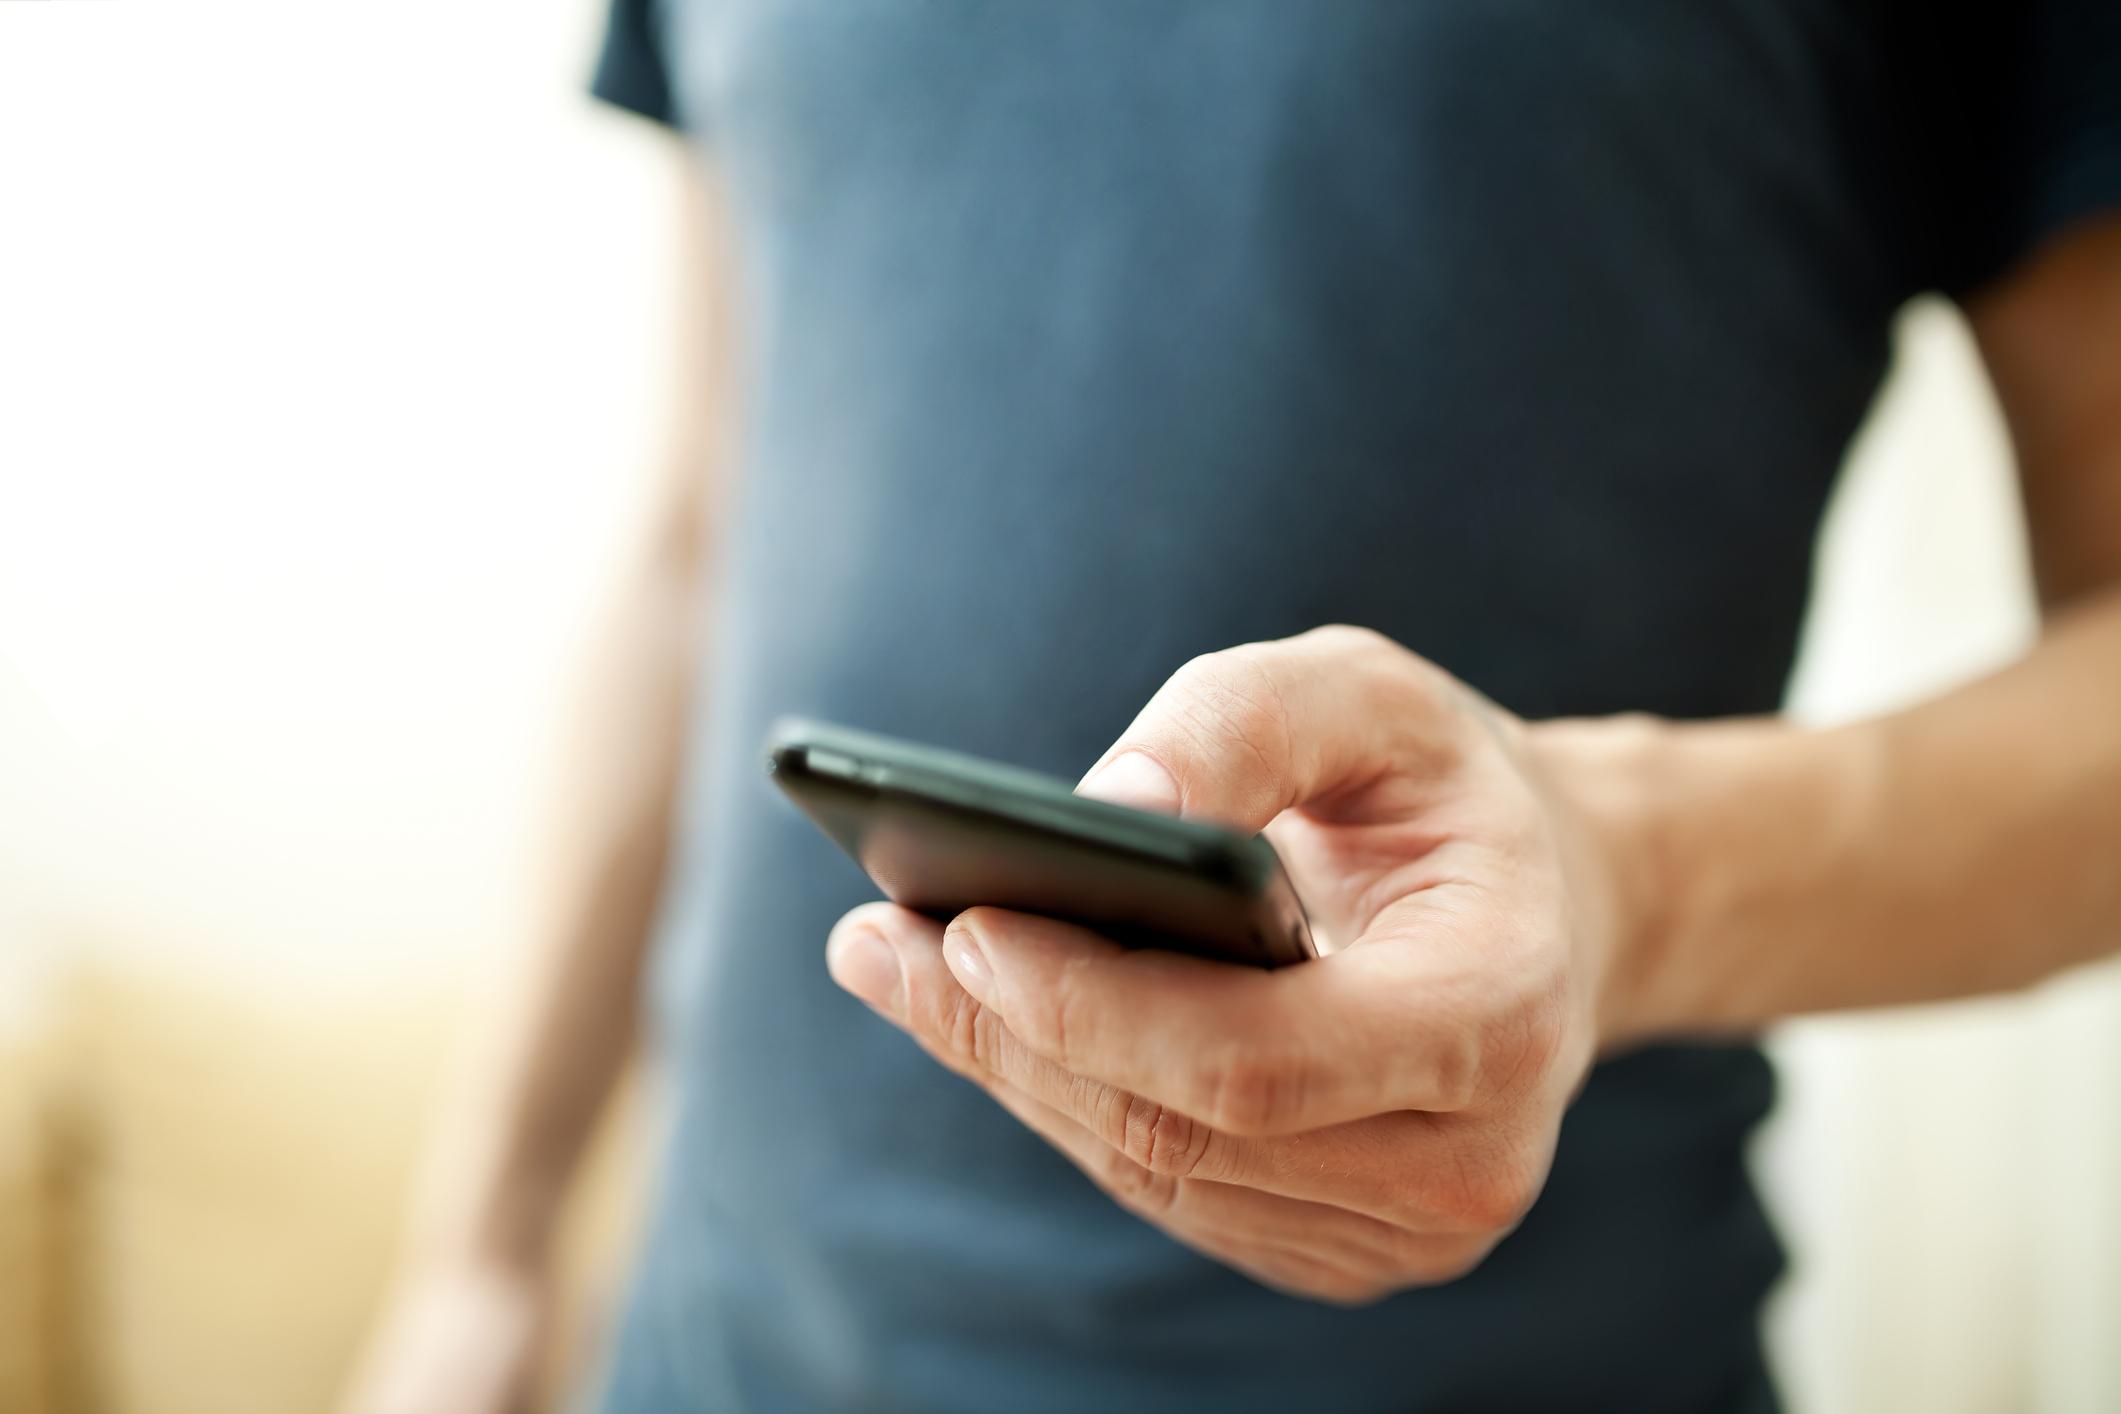 Man holding smartphone.